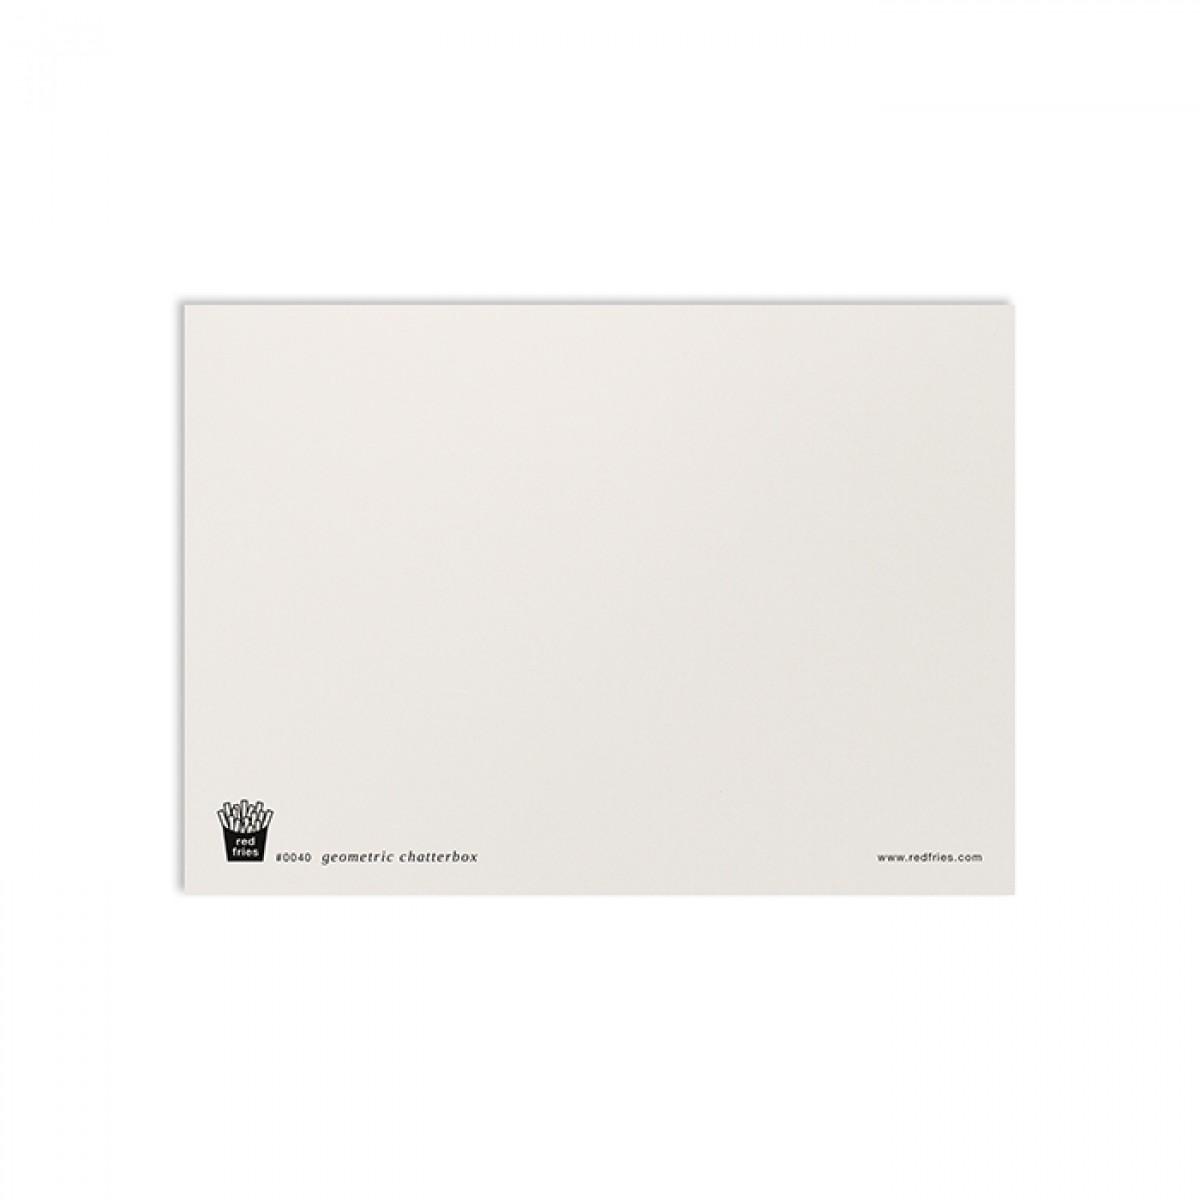 redfries geometric chatterbox – Postkarte DIN A6